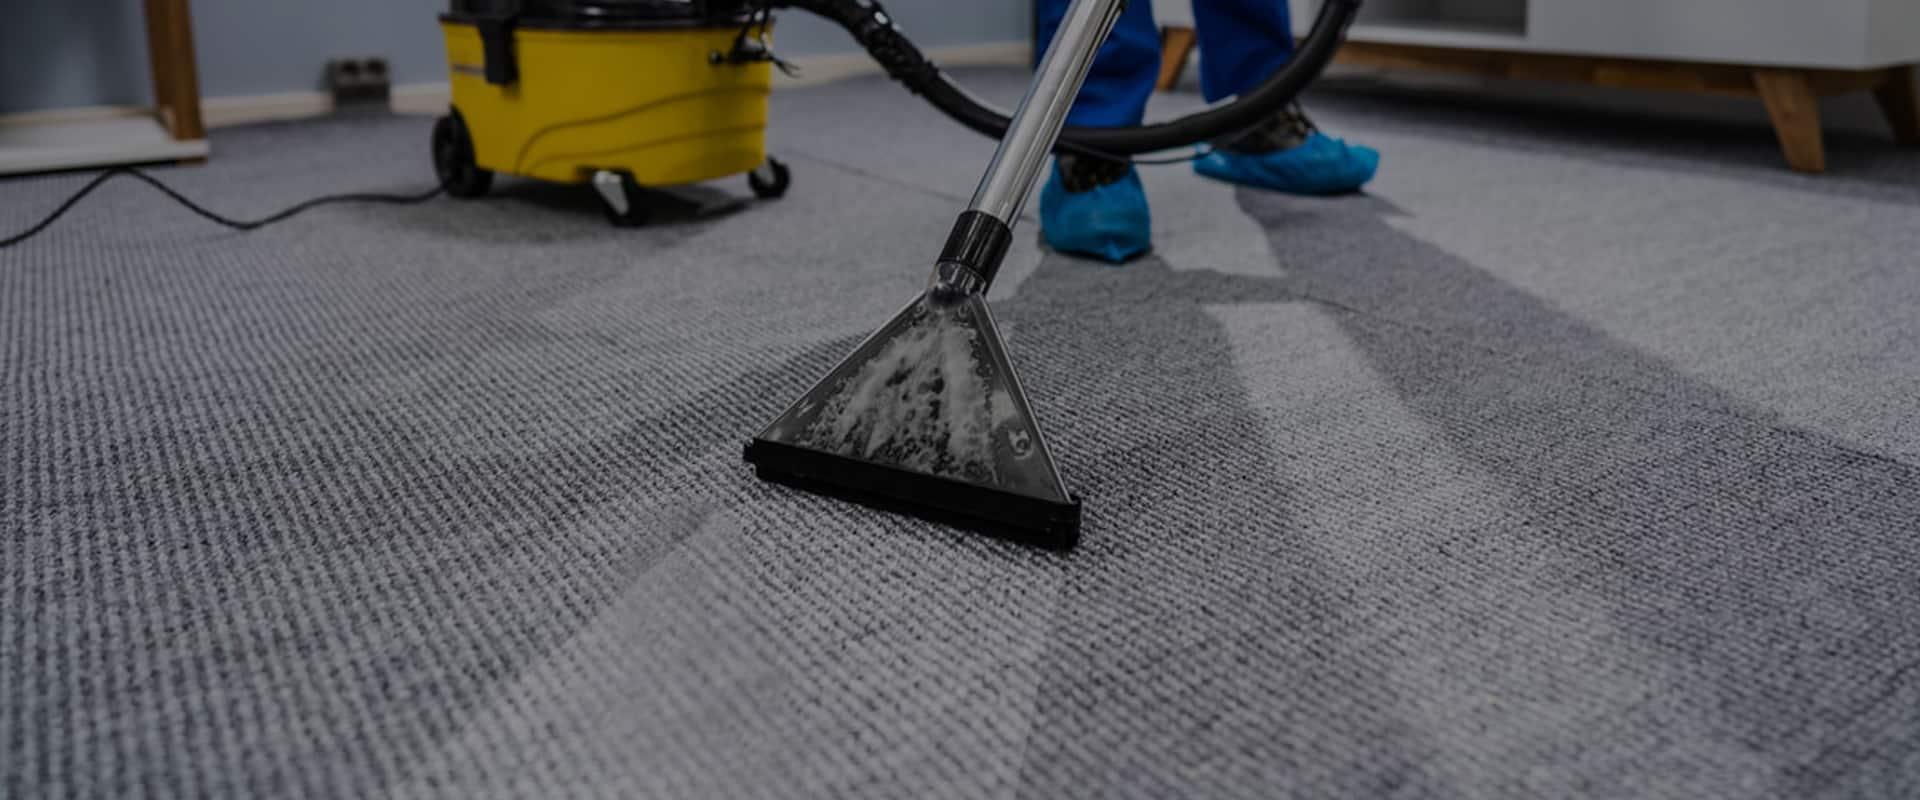 sExpert Carpet Cleaning Pakenham